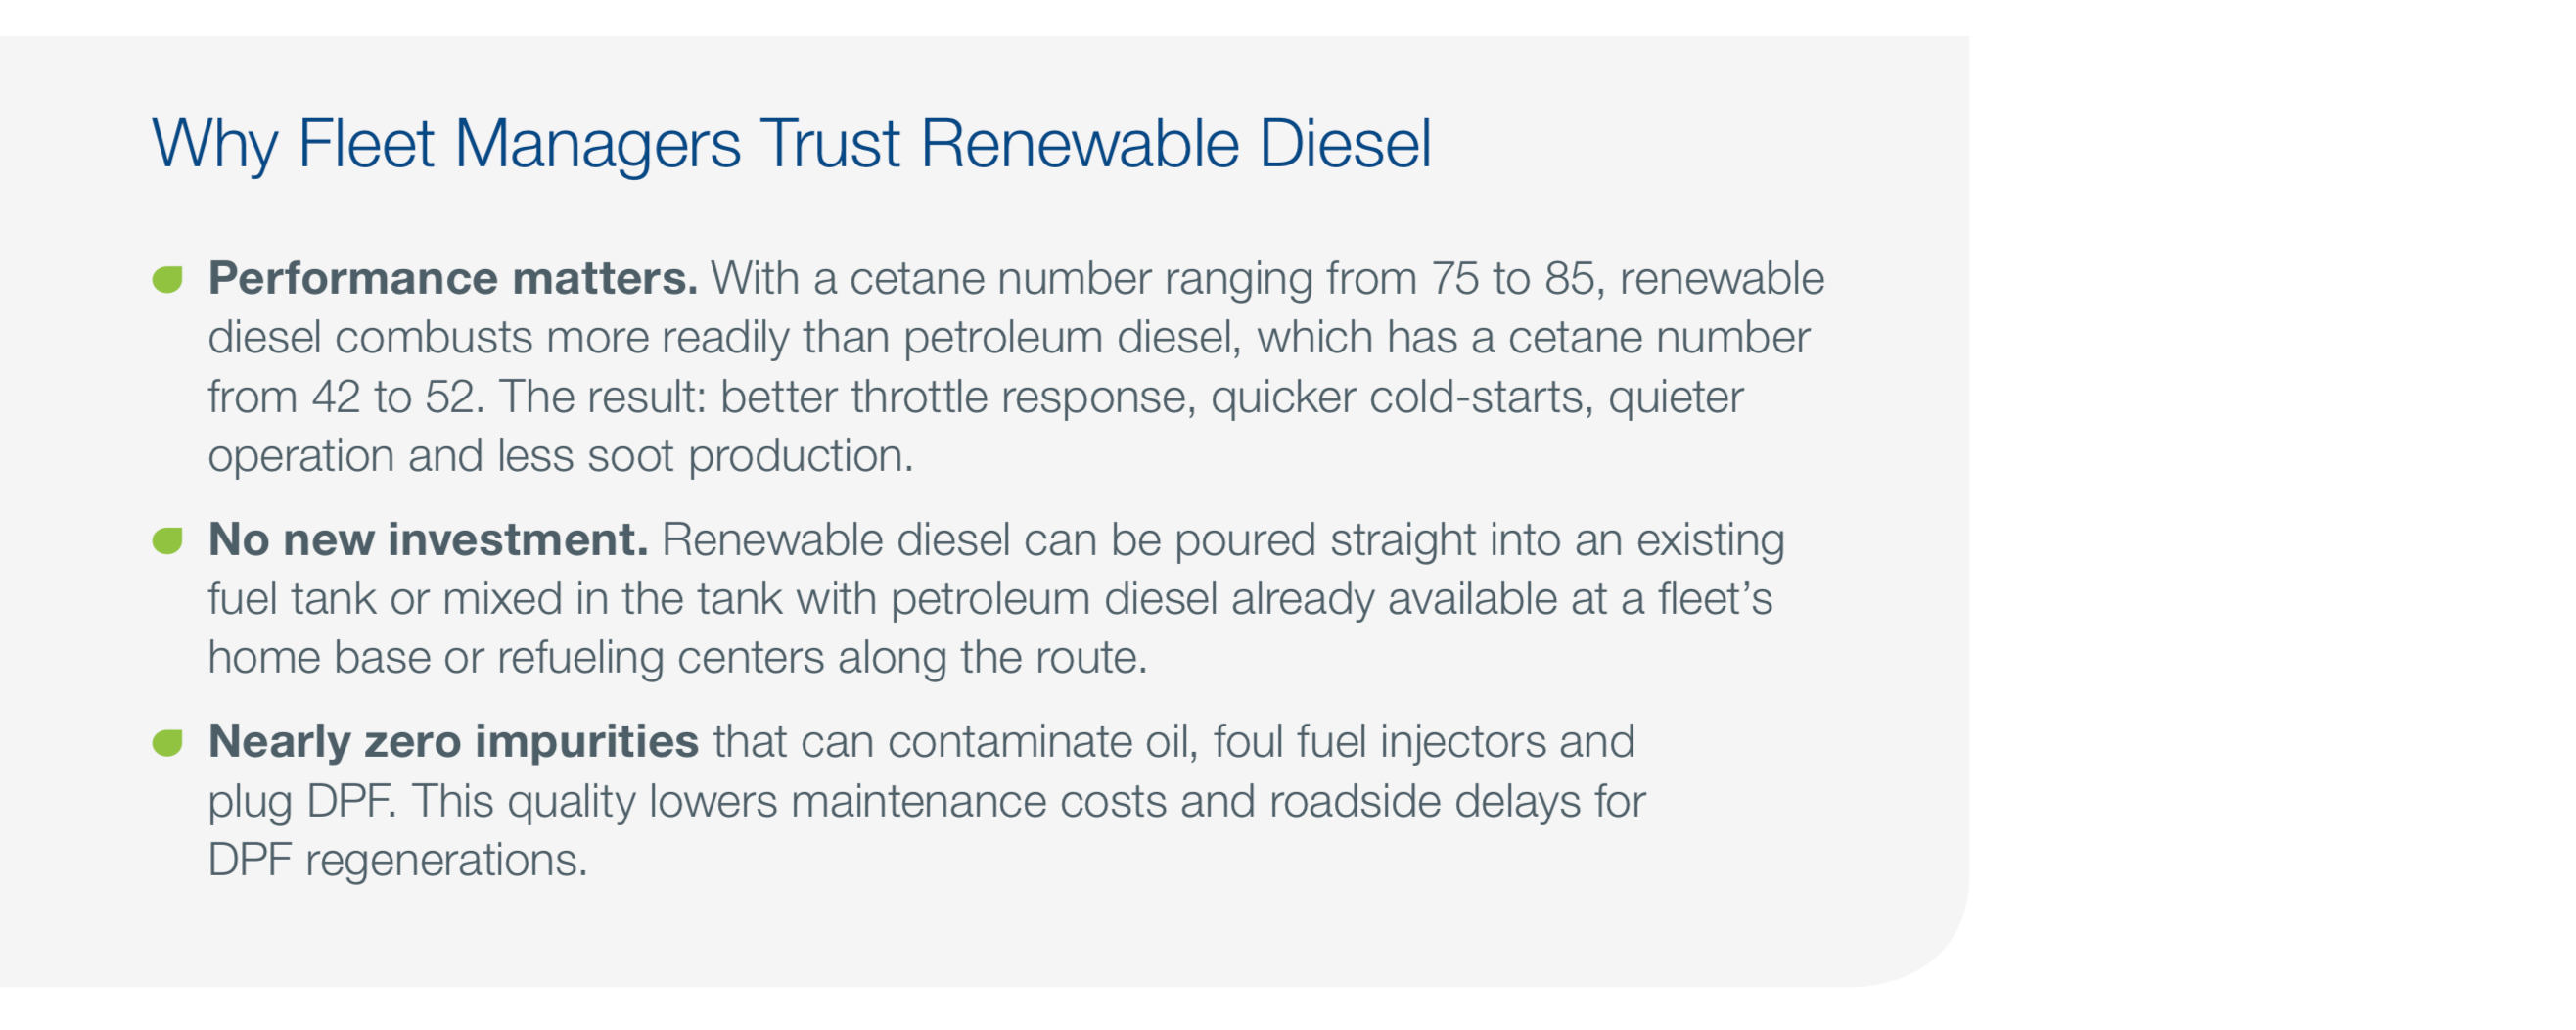 Why Trust Renewable